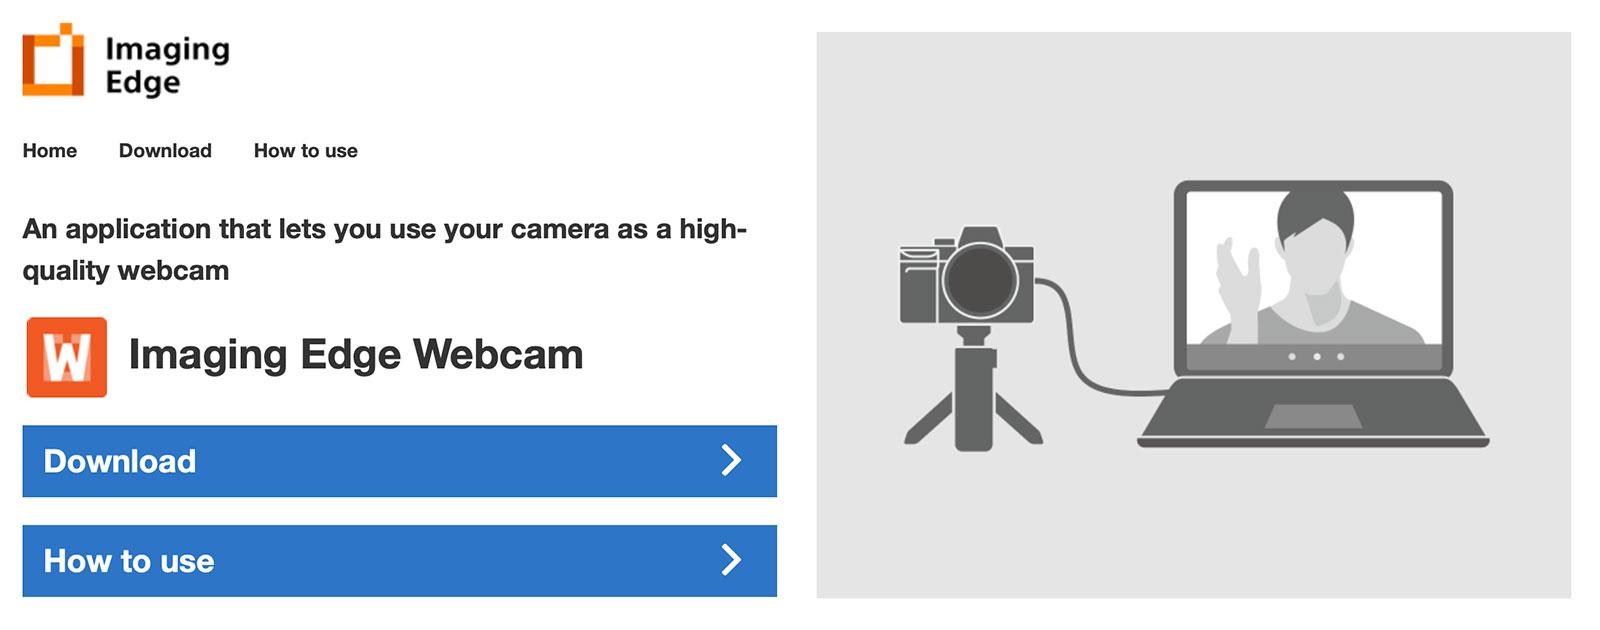 Sony Imaging Edge Webcam